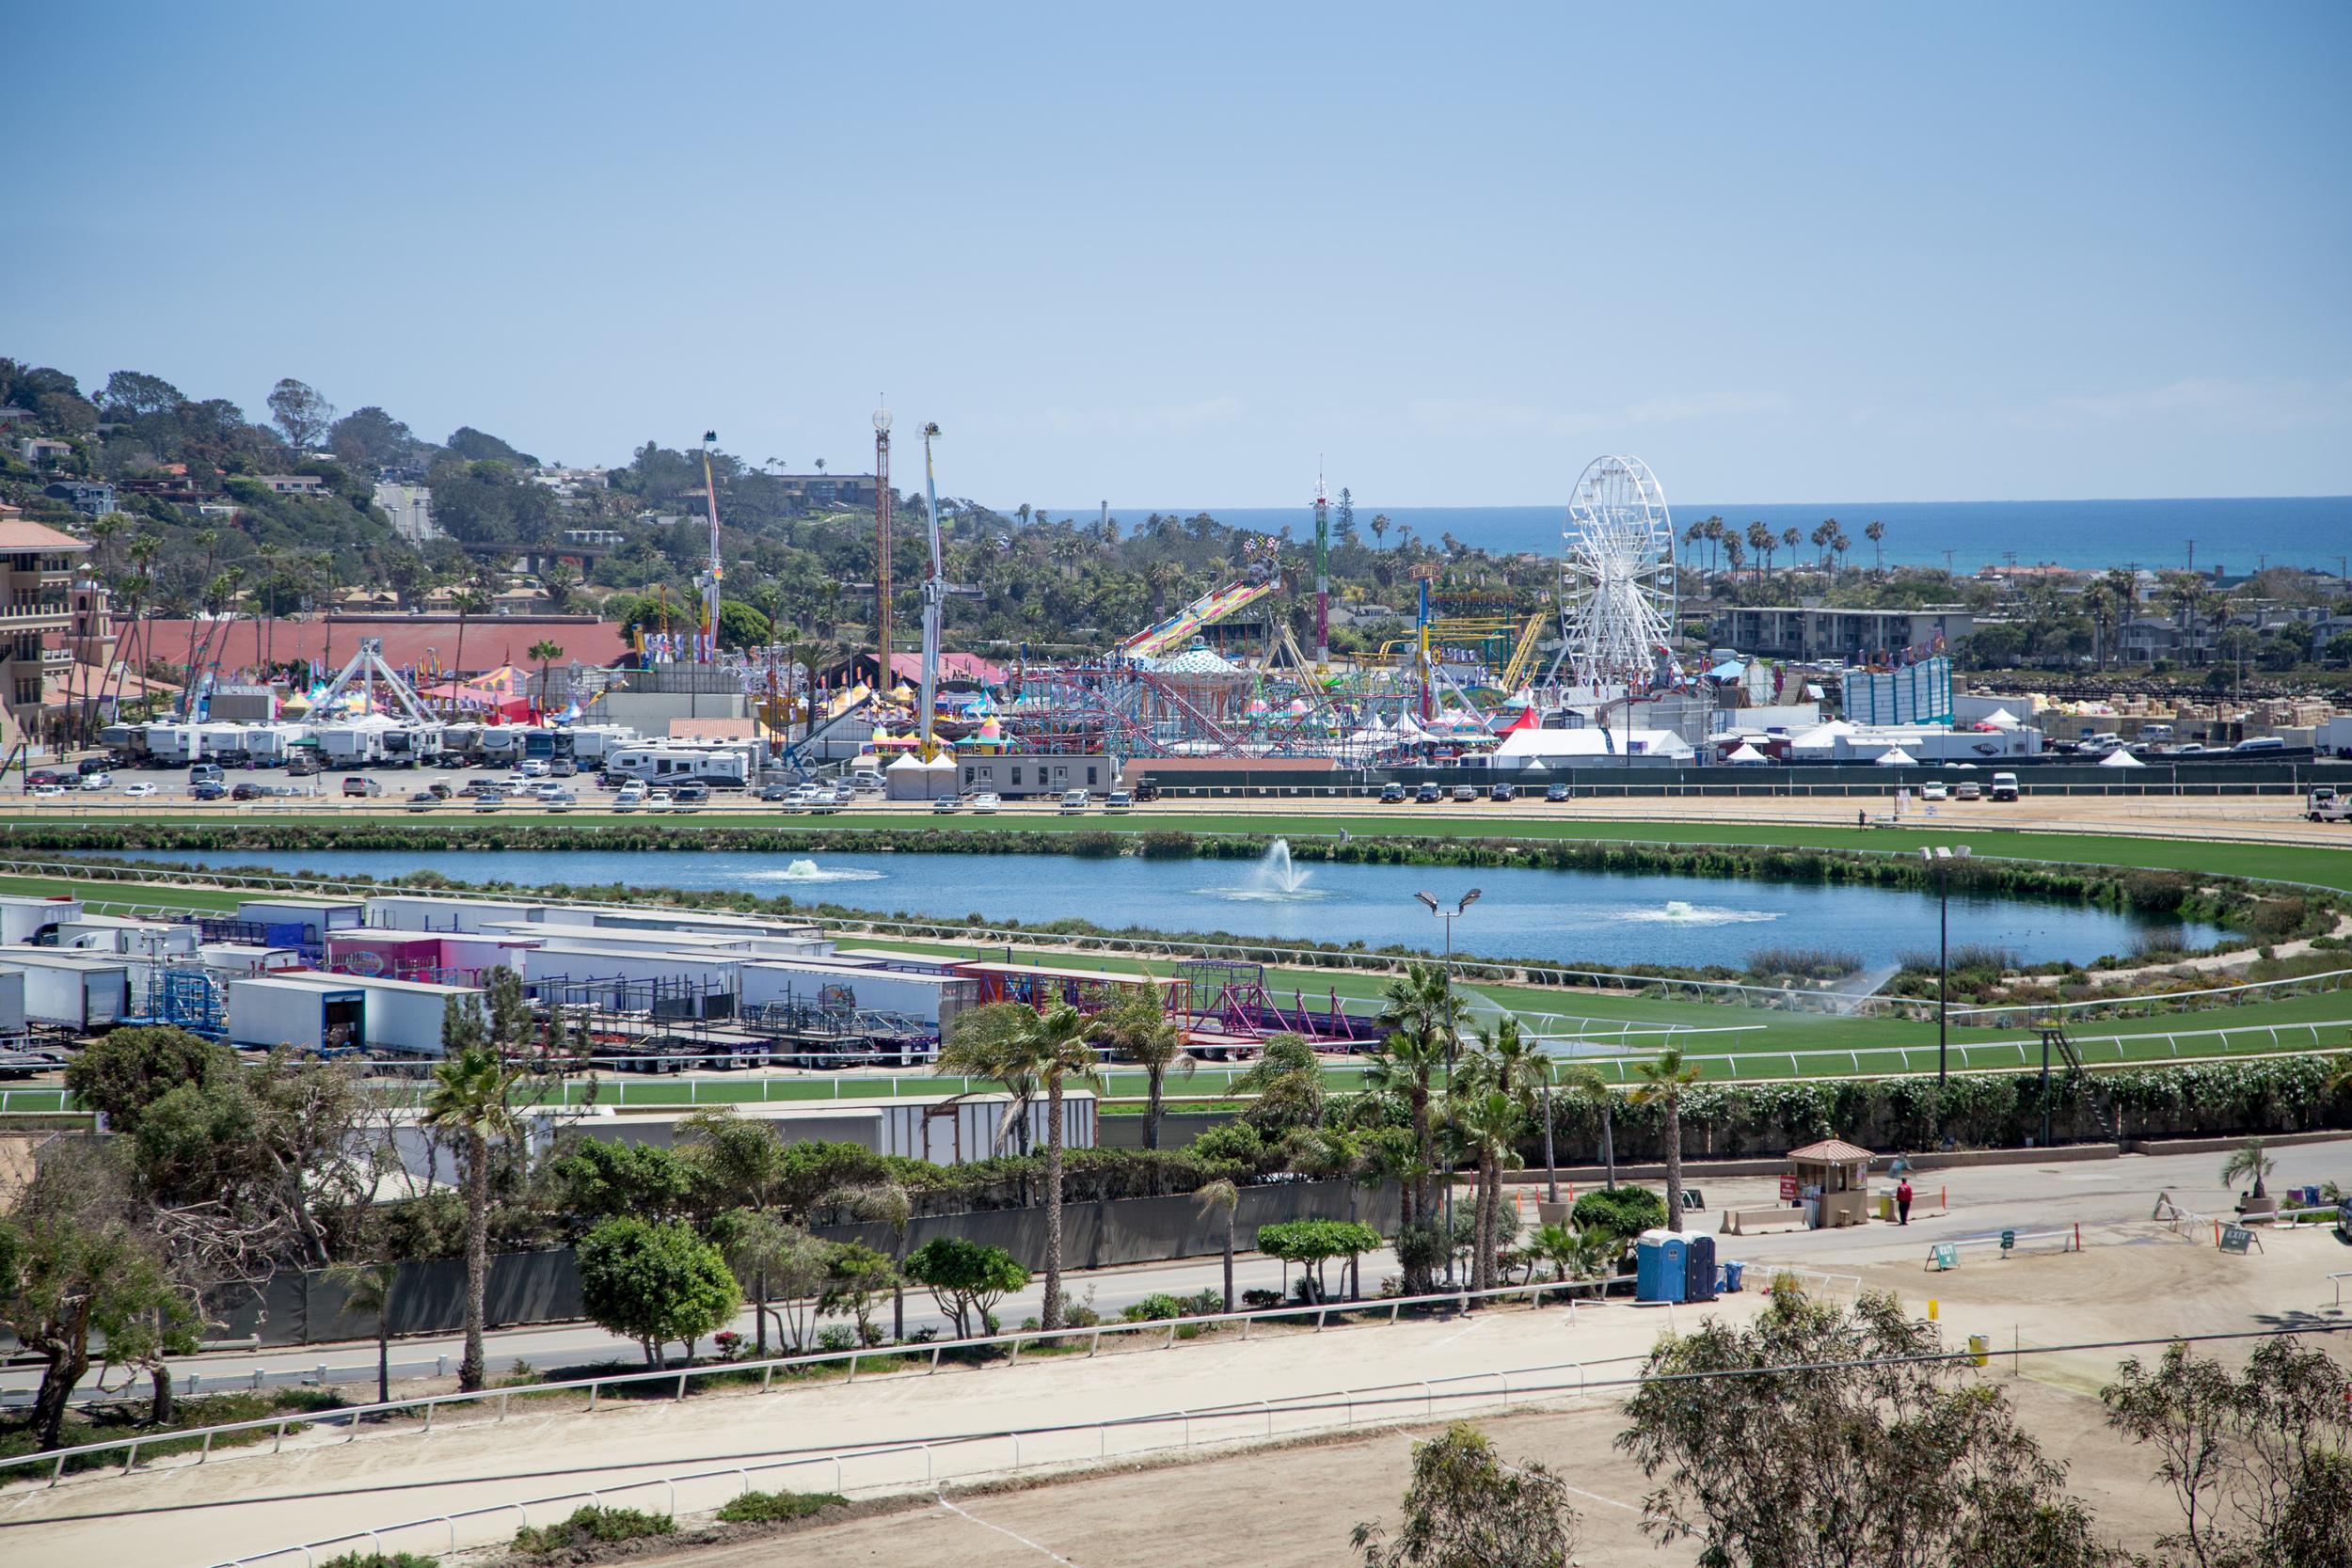 Overlooks the Del Mar Fairgrounds